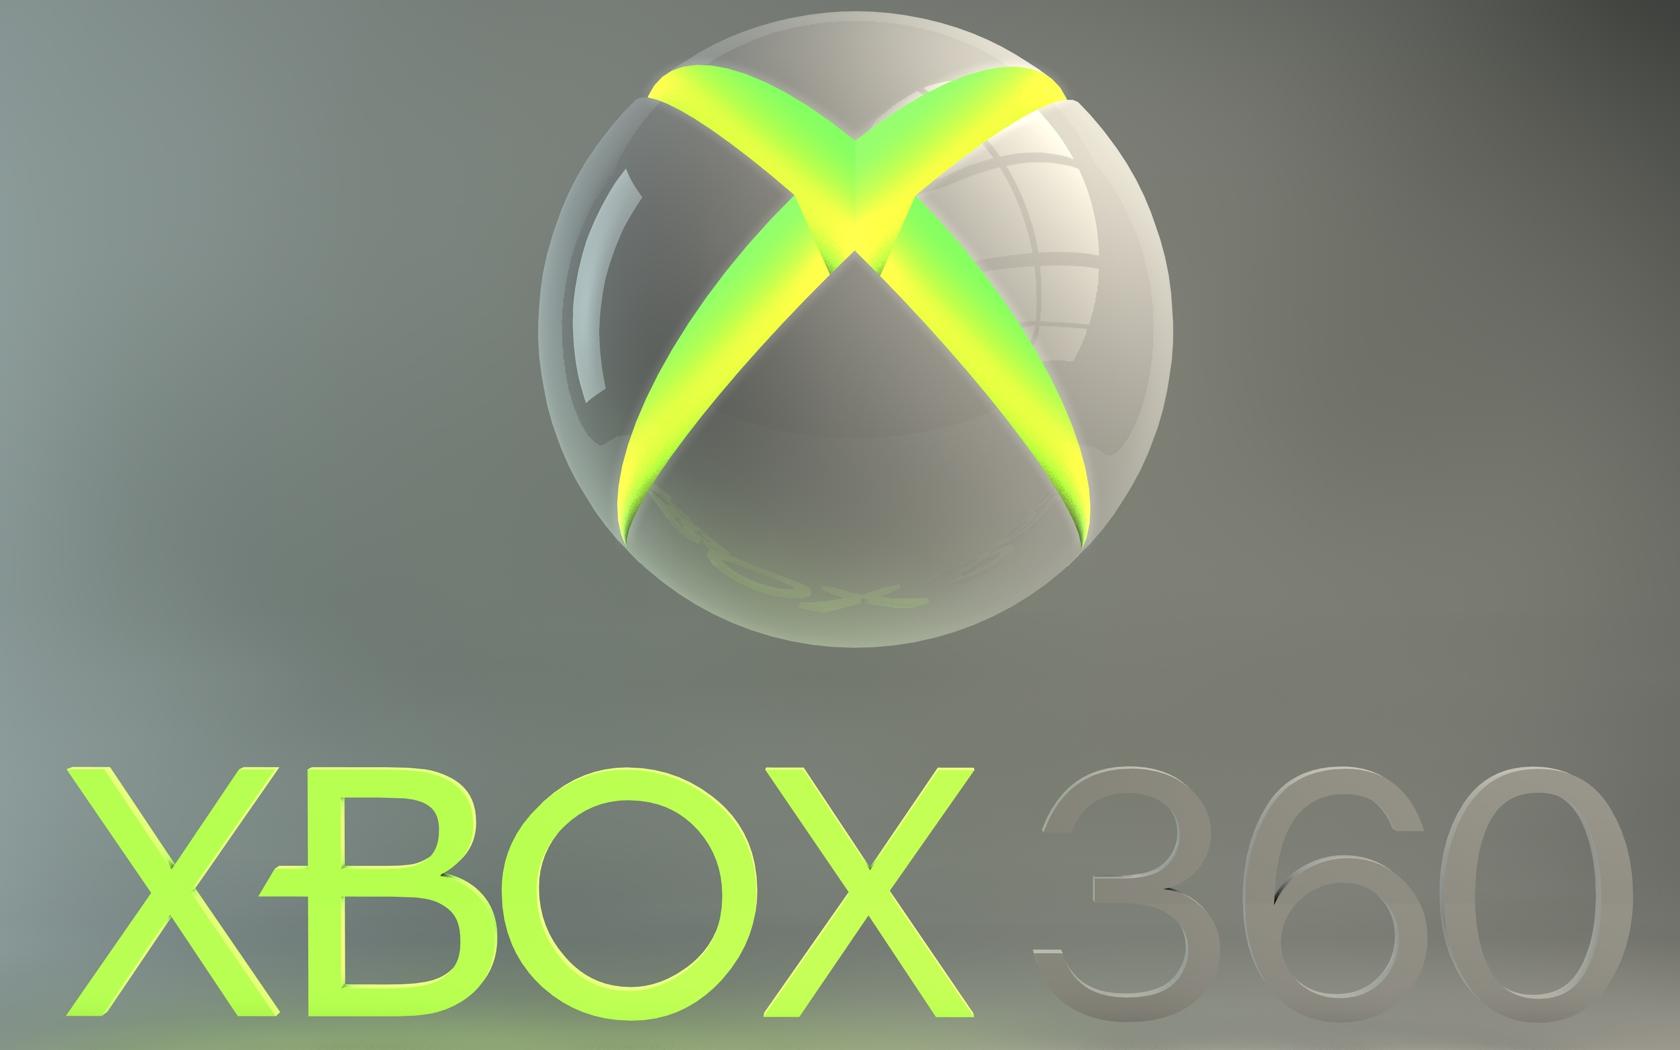 xbox 360 logo by dracu teufel666 customization wallpaper 3 dimensional 1680x1050